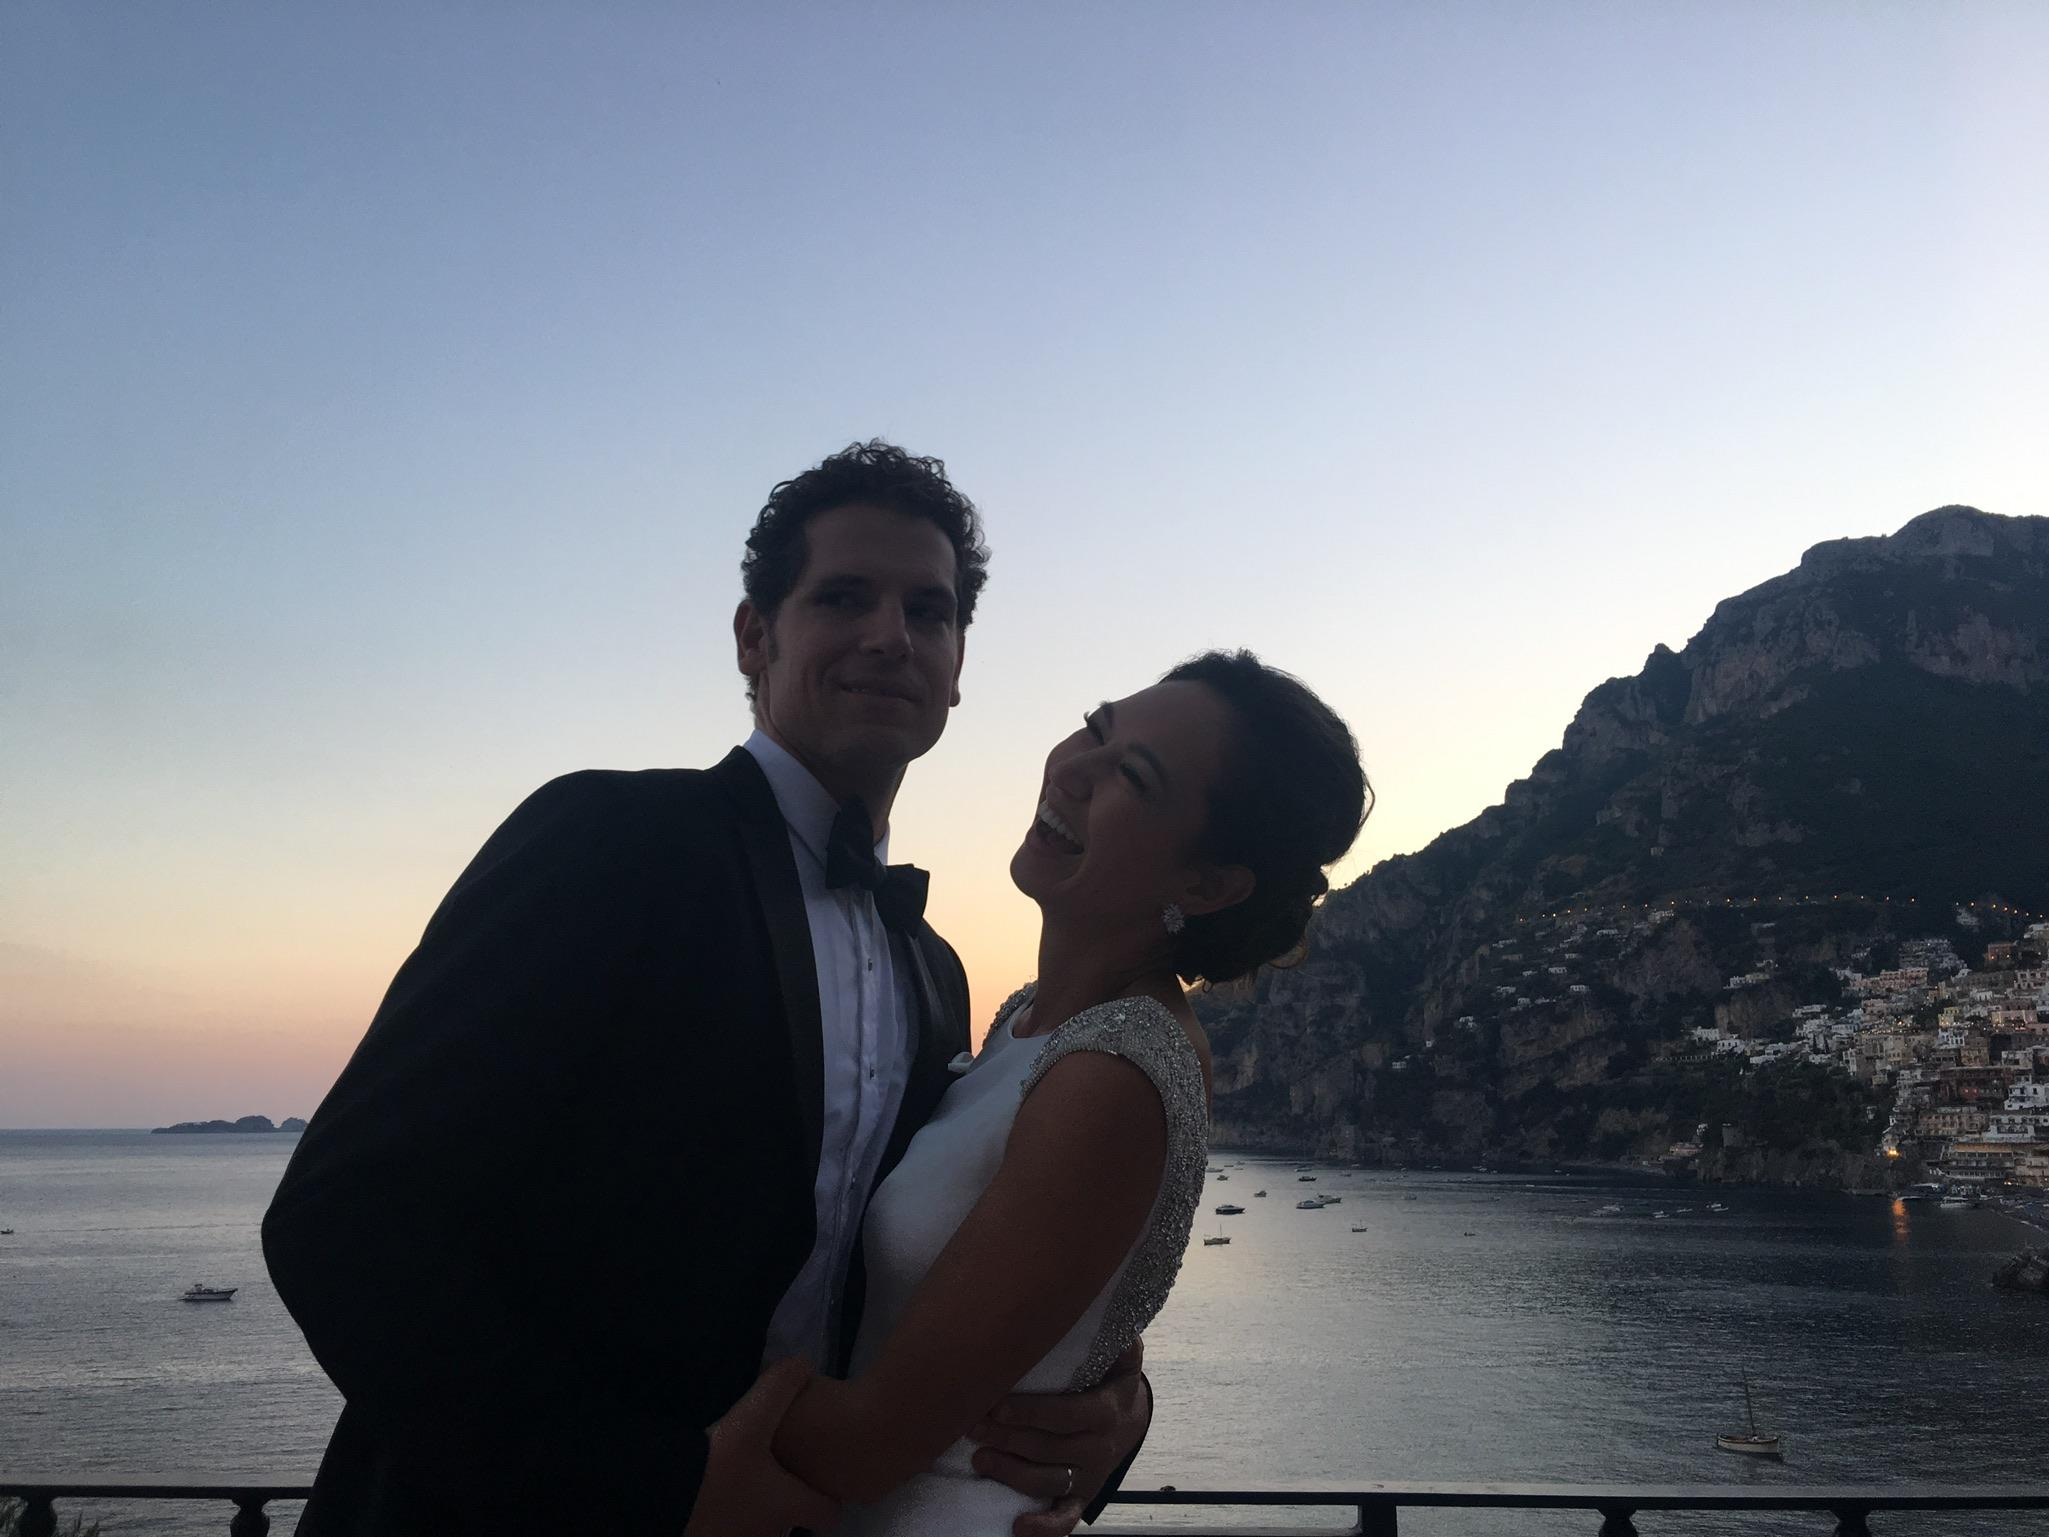 http://www.weddingamalfi.com/wp-content/uploads/Nathalie-and-Benjamin-wedding-in-Positano-30.jpg